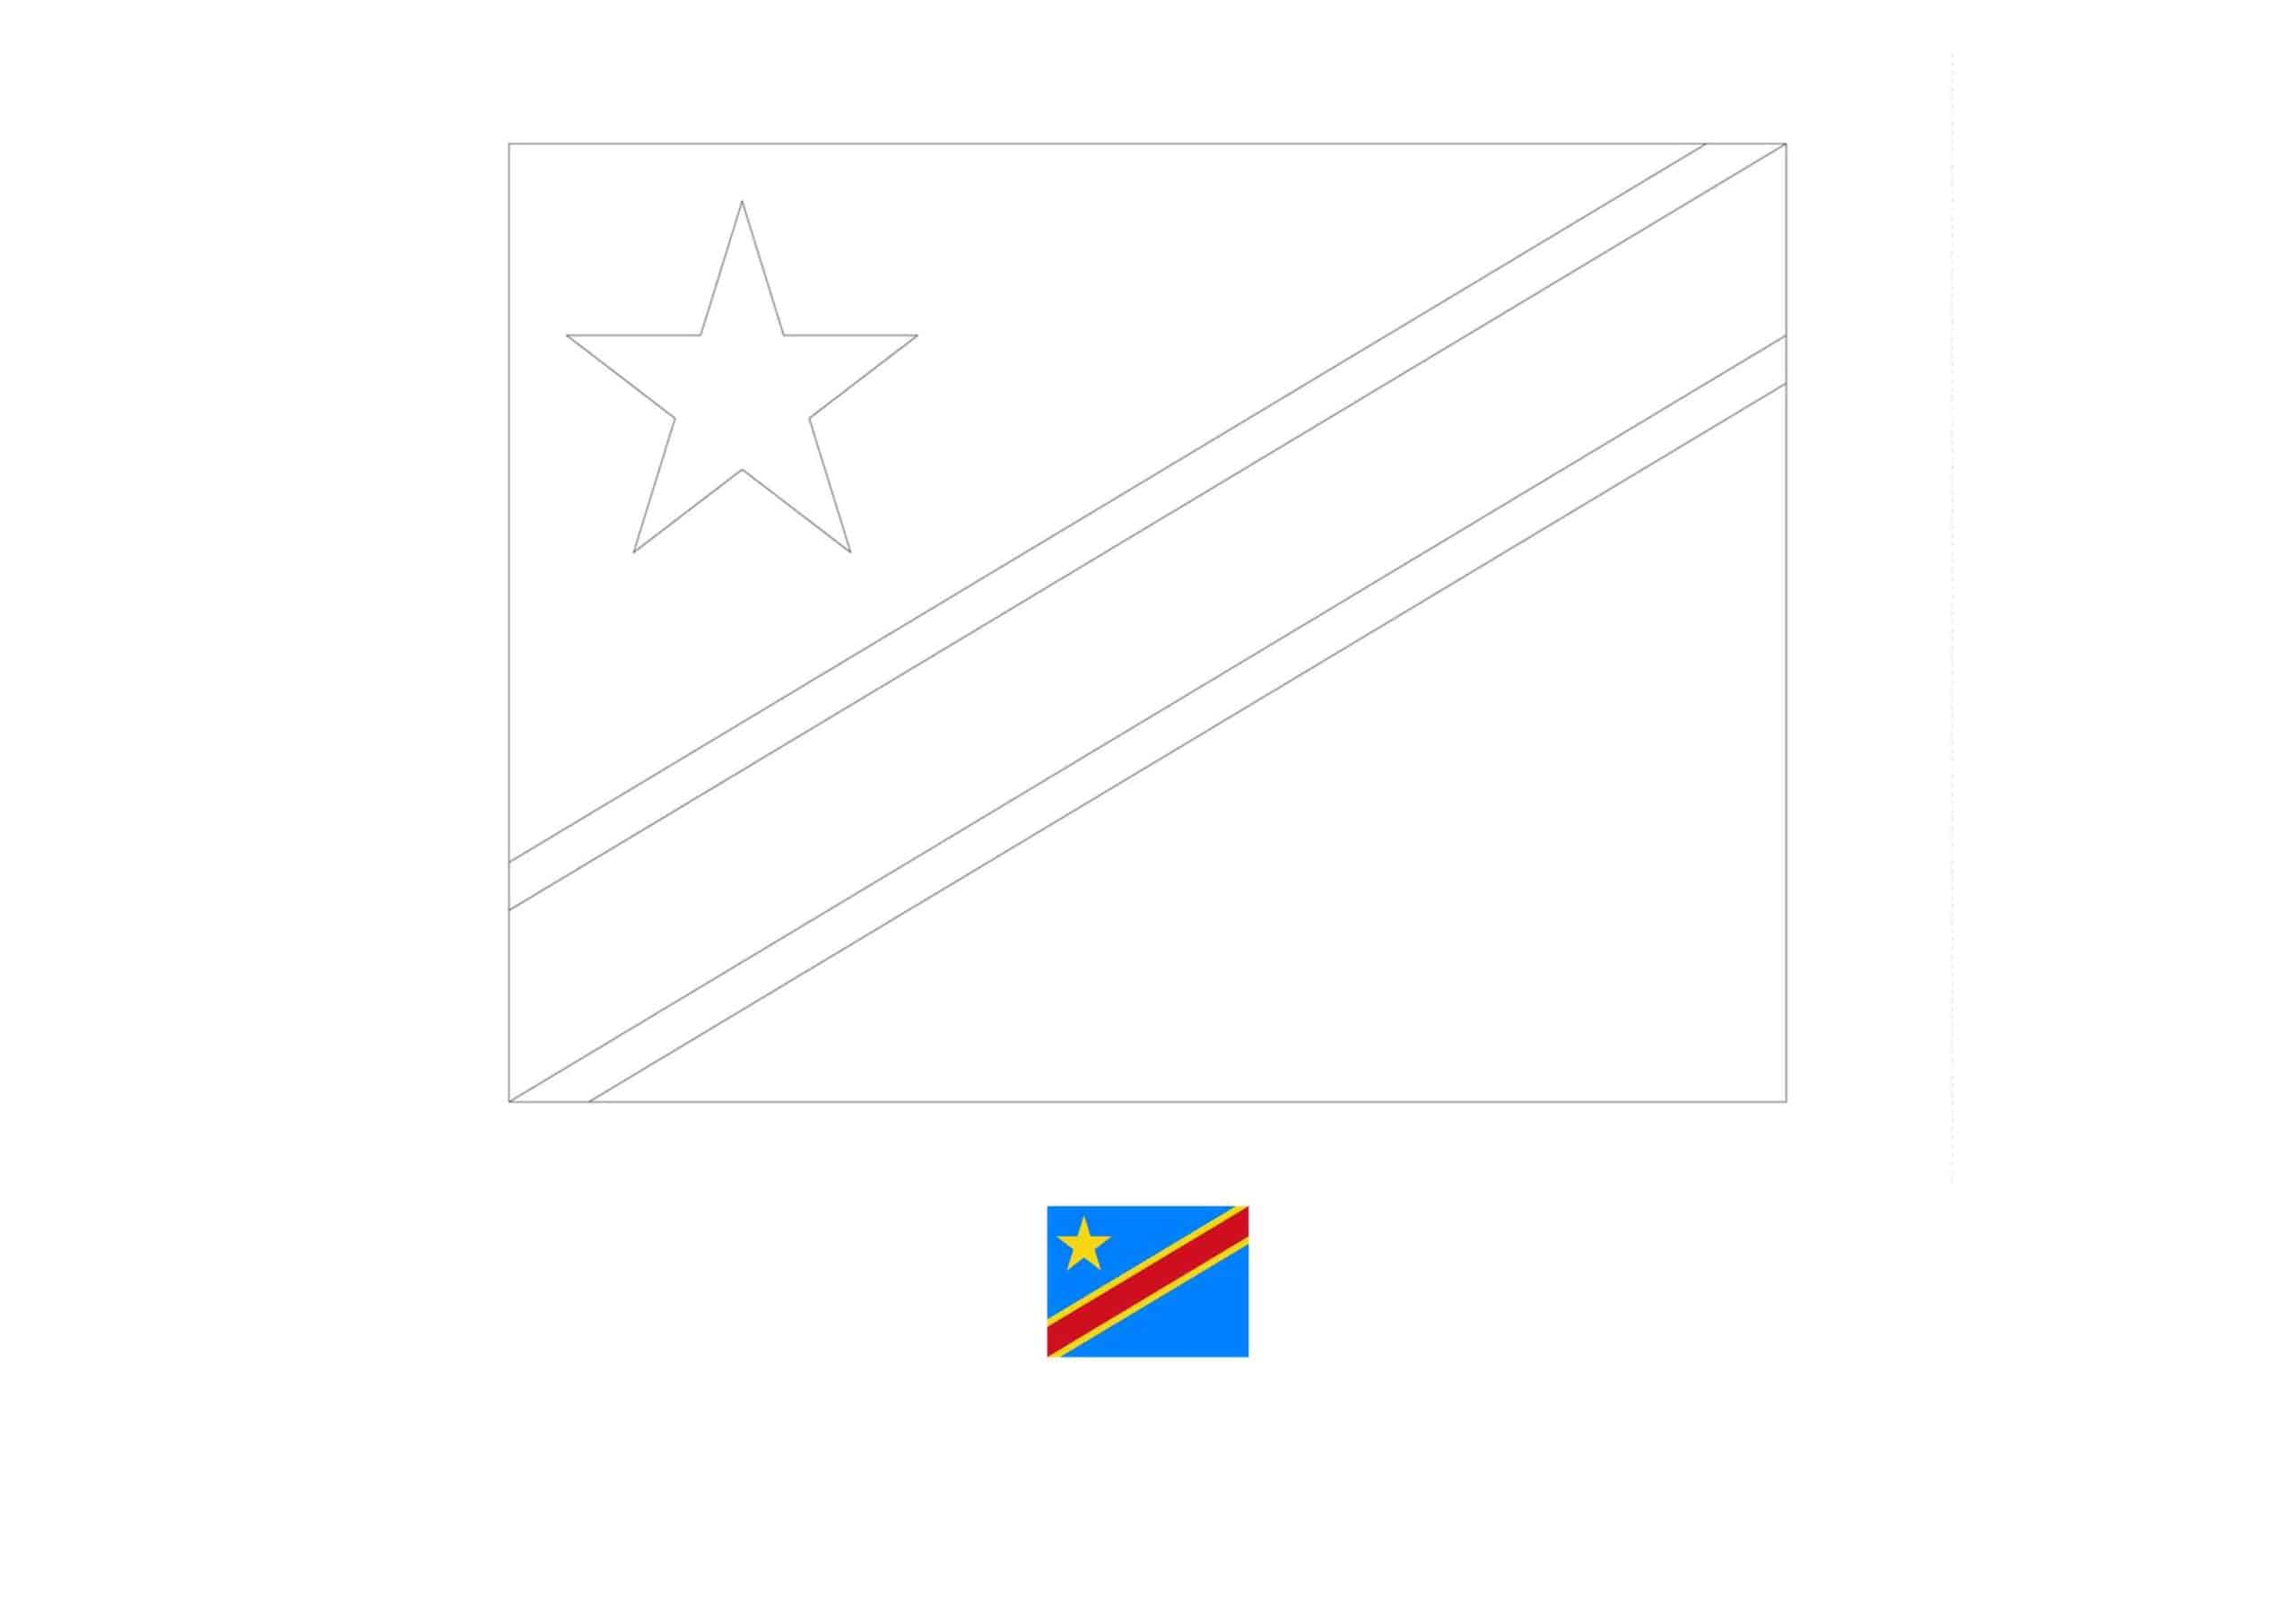 Congo Kinshasa flag coloring page with a sample